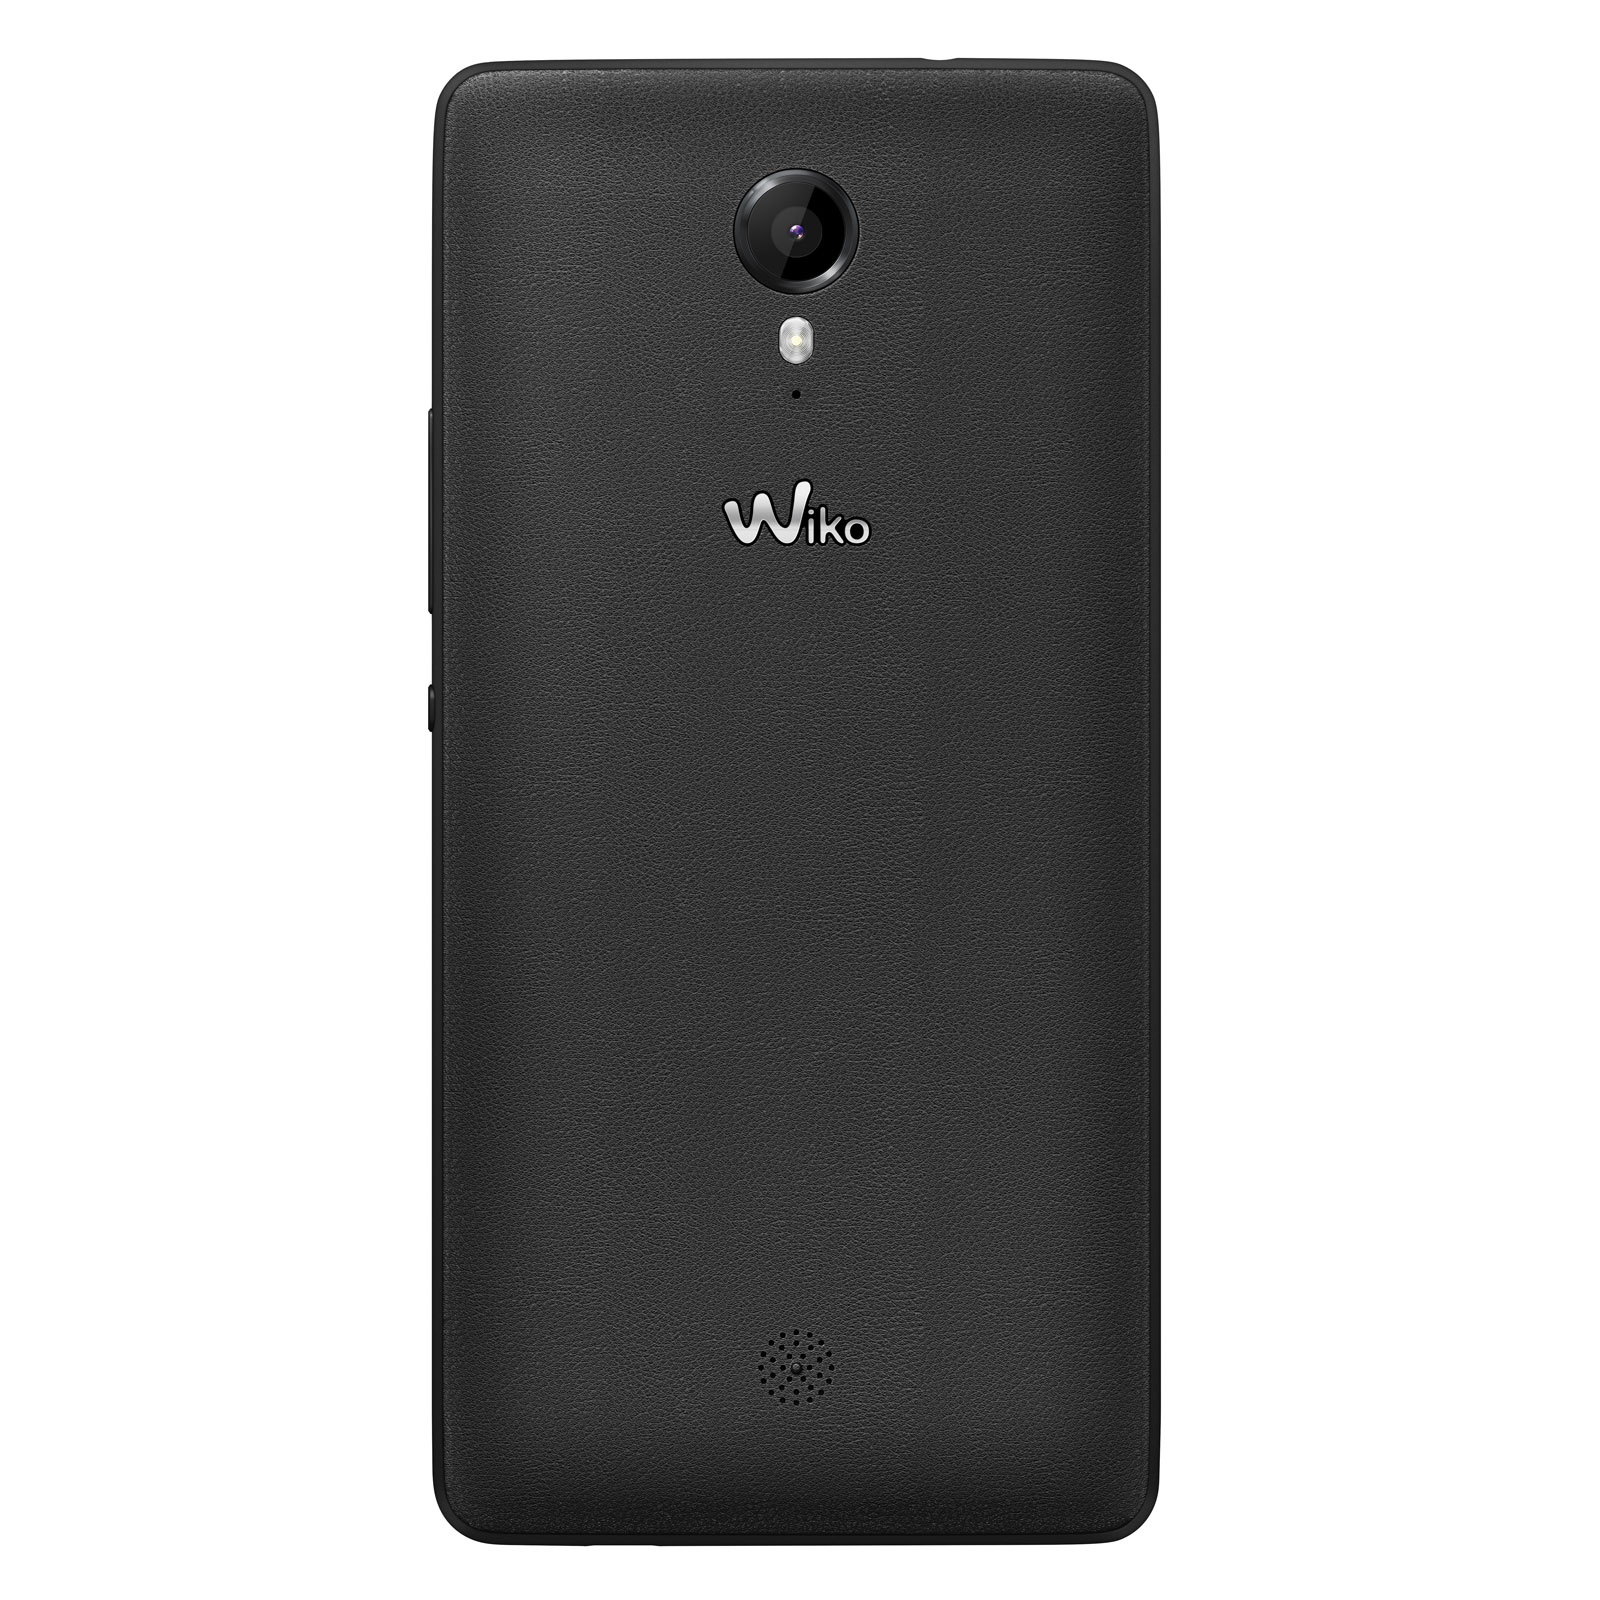 Wiko tommy noir mobile smartphone wiko sur for Photo ecran wiko